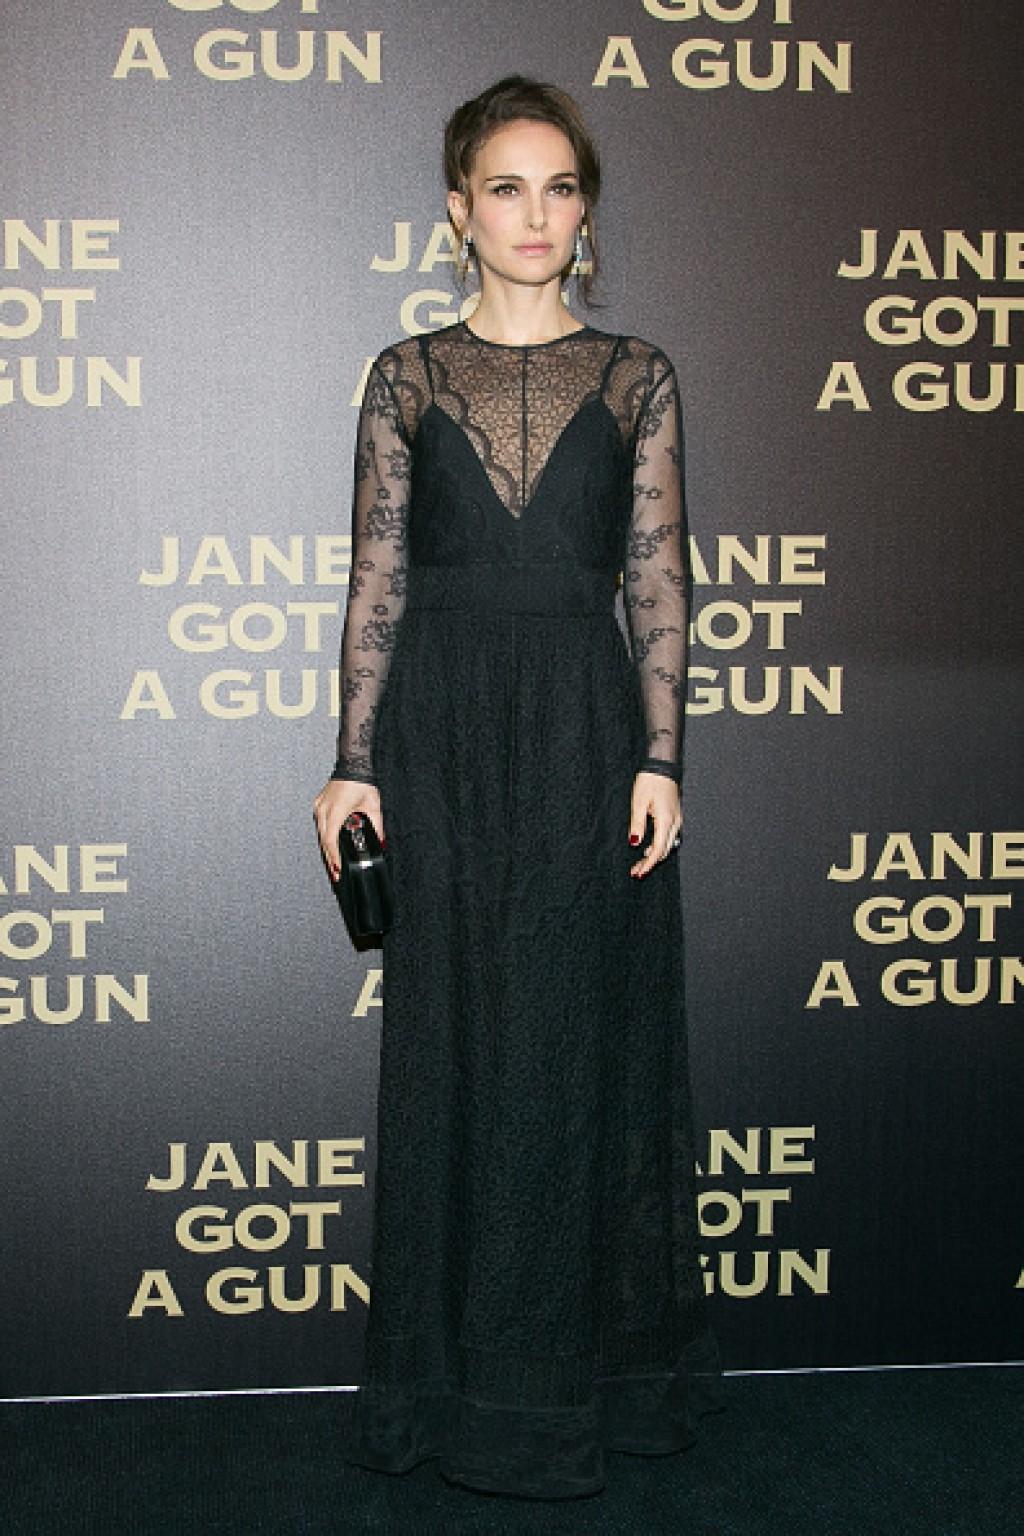 Jane-Got-A-Gun-Paris-Premiere-Natalie-Portman-1024x1536